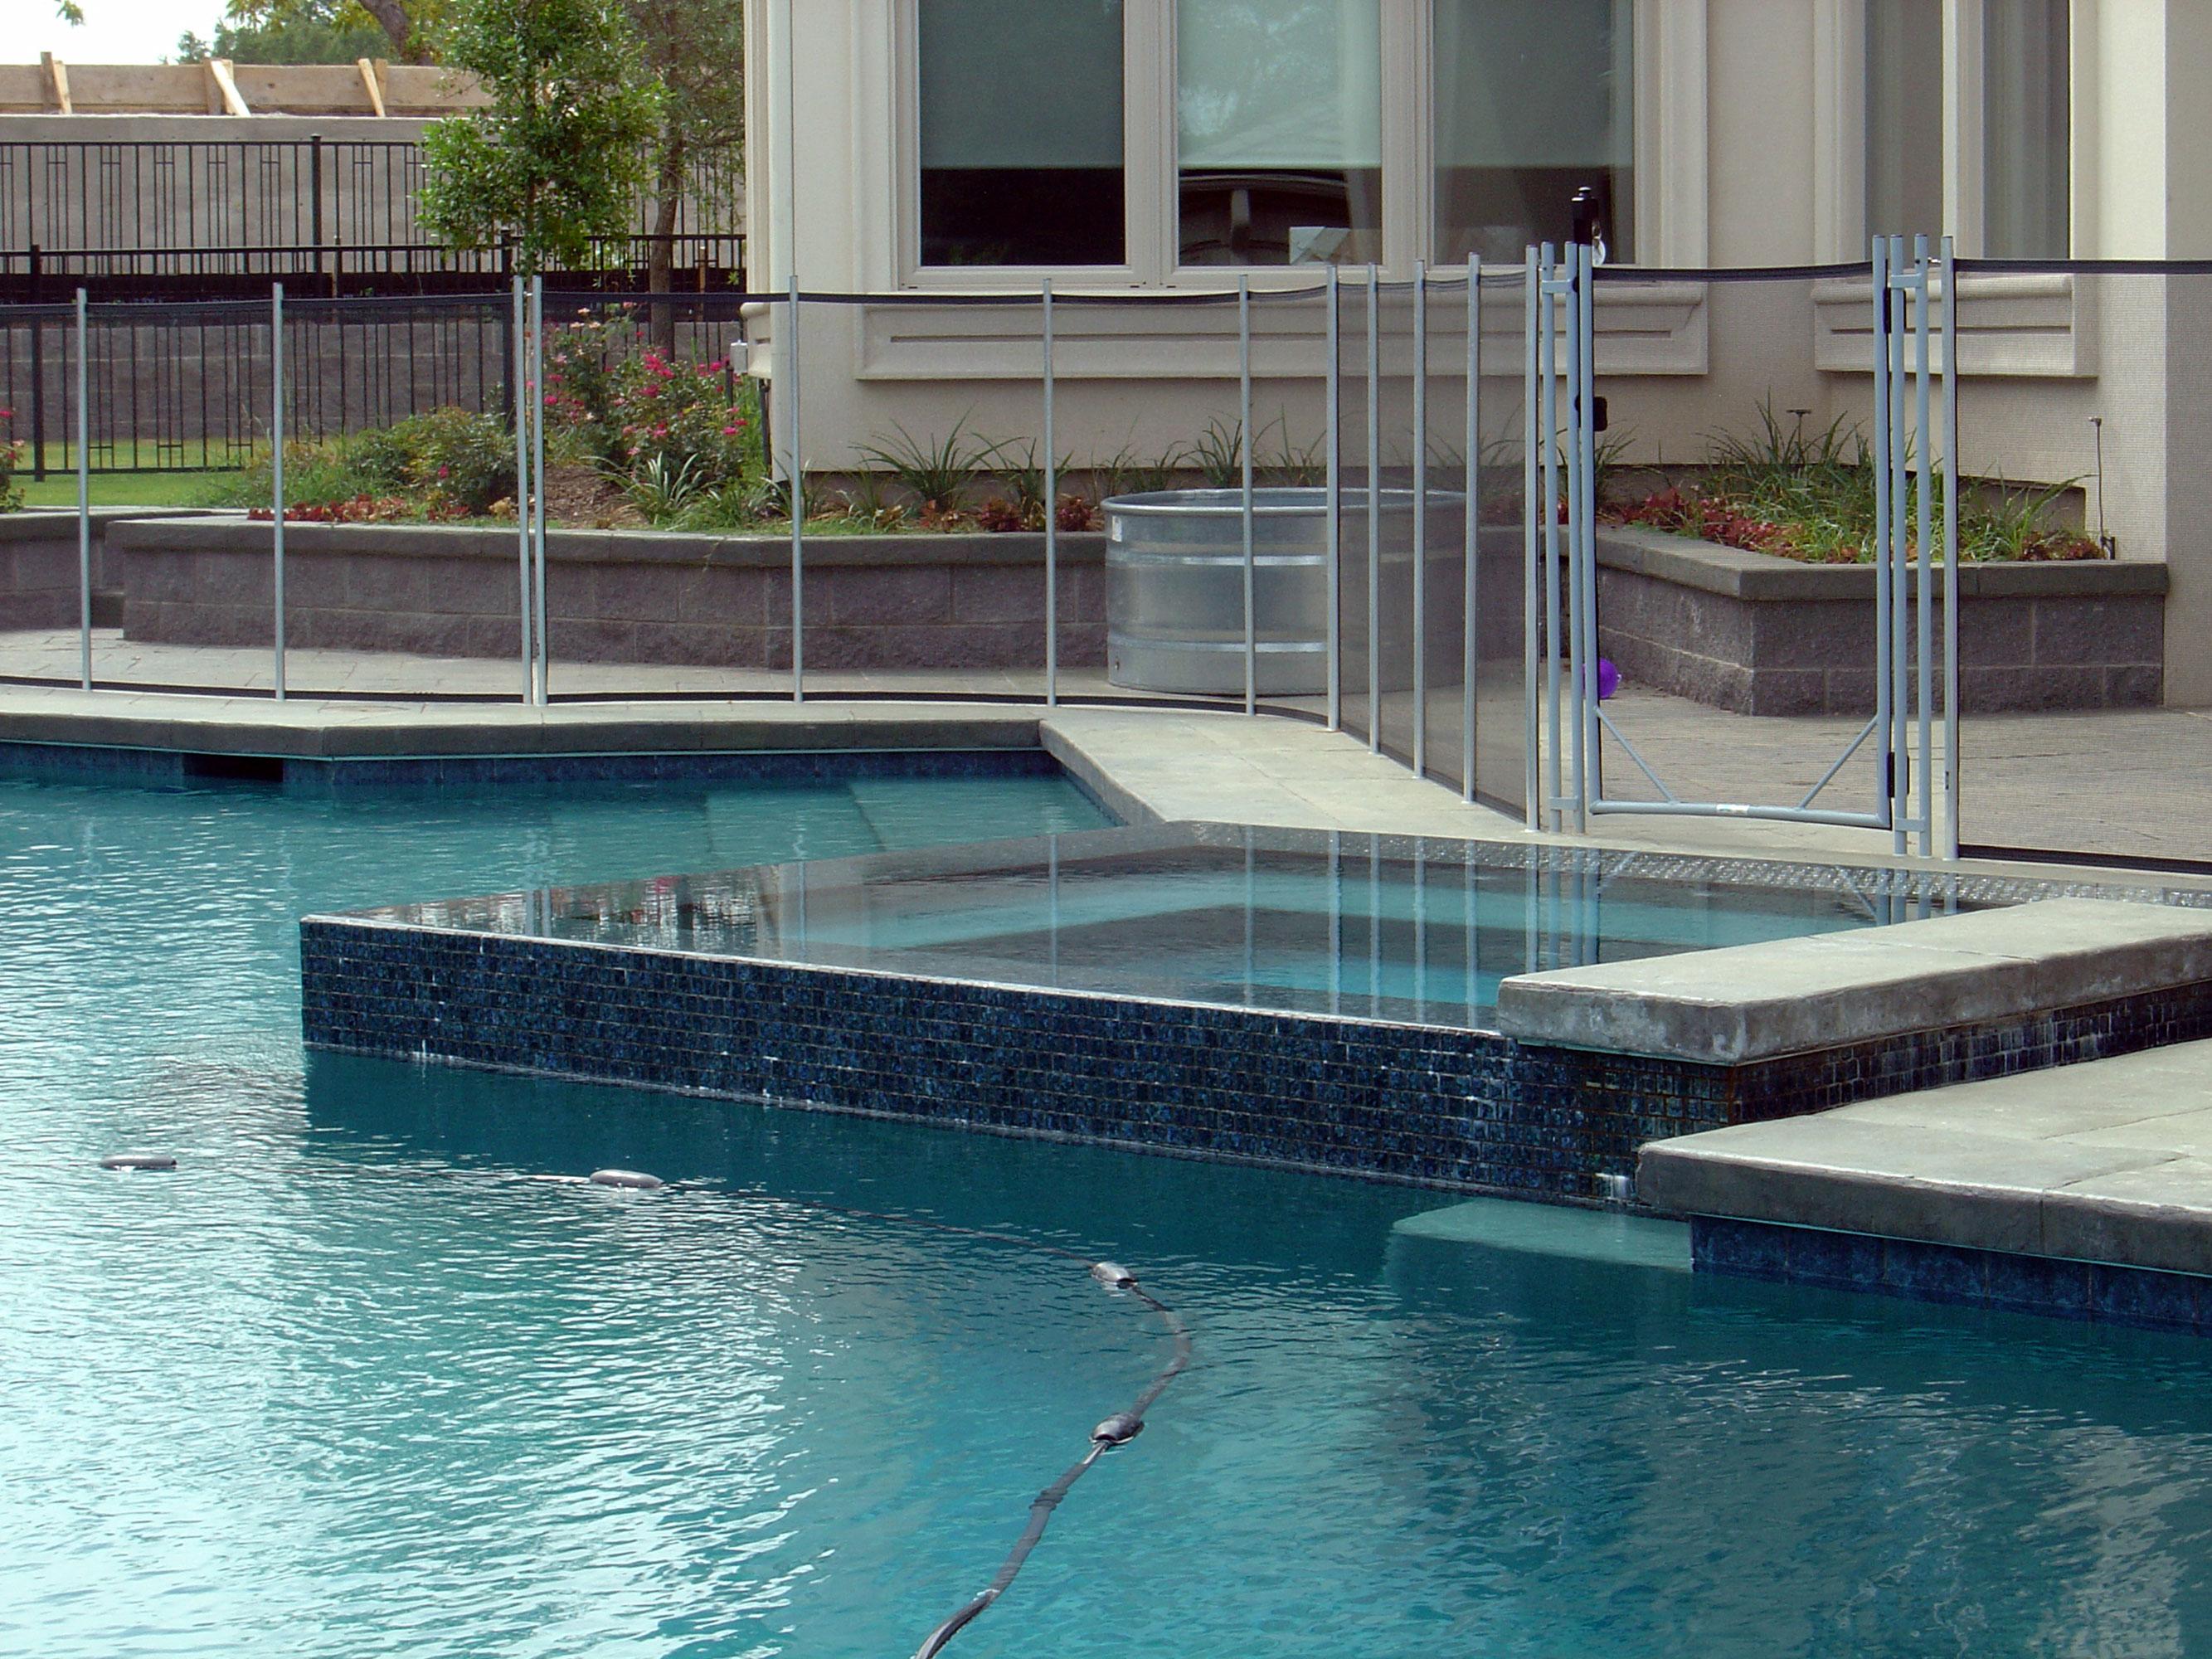 Pool 67